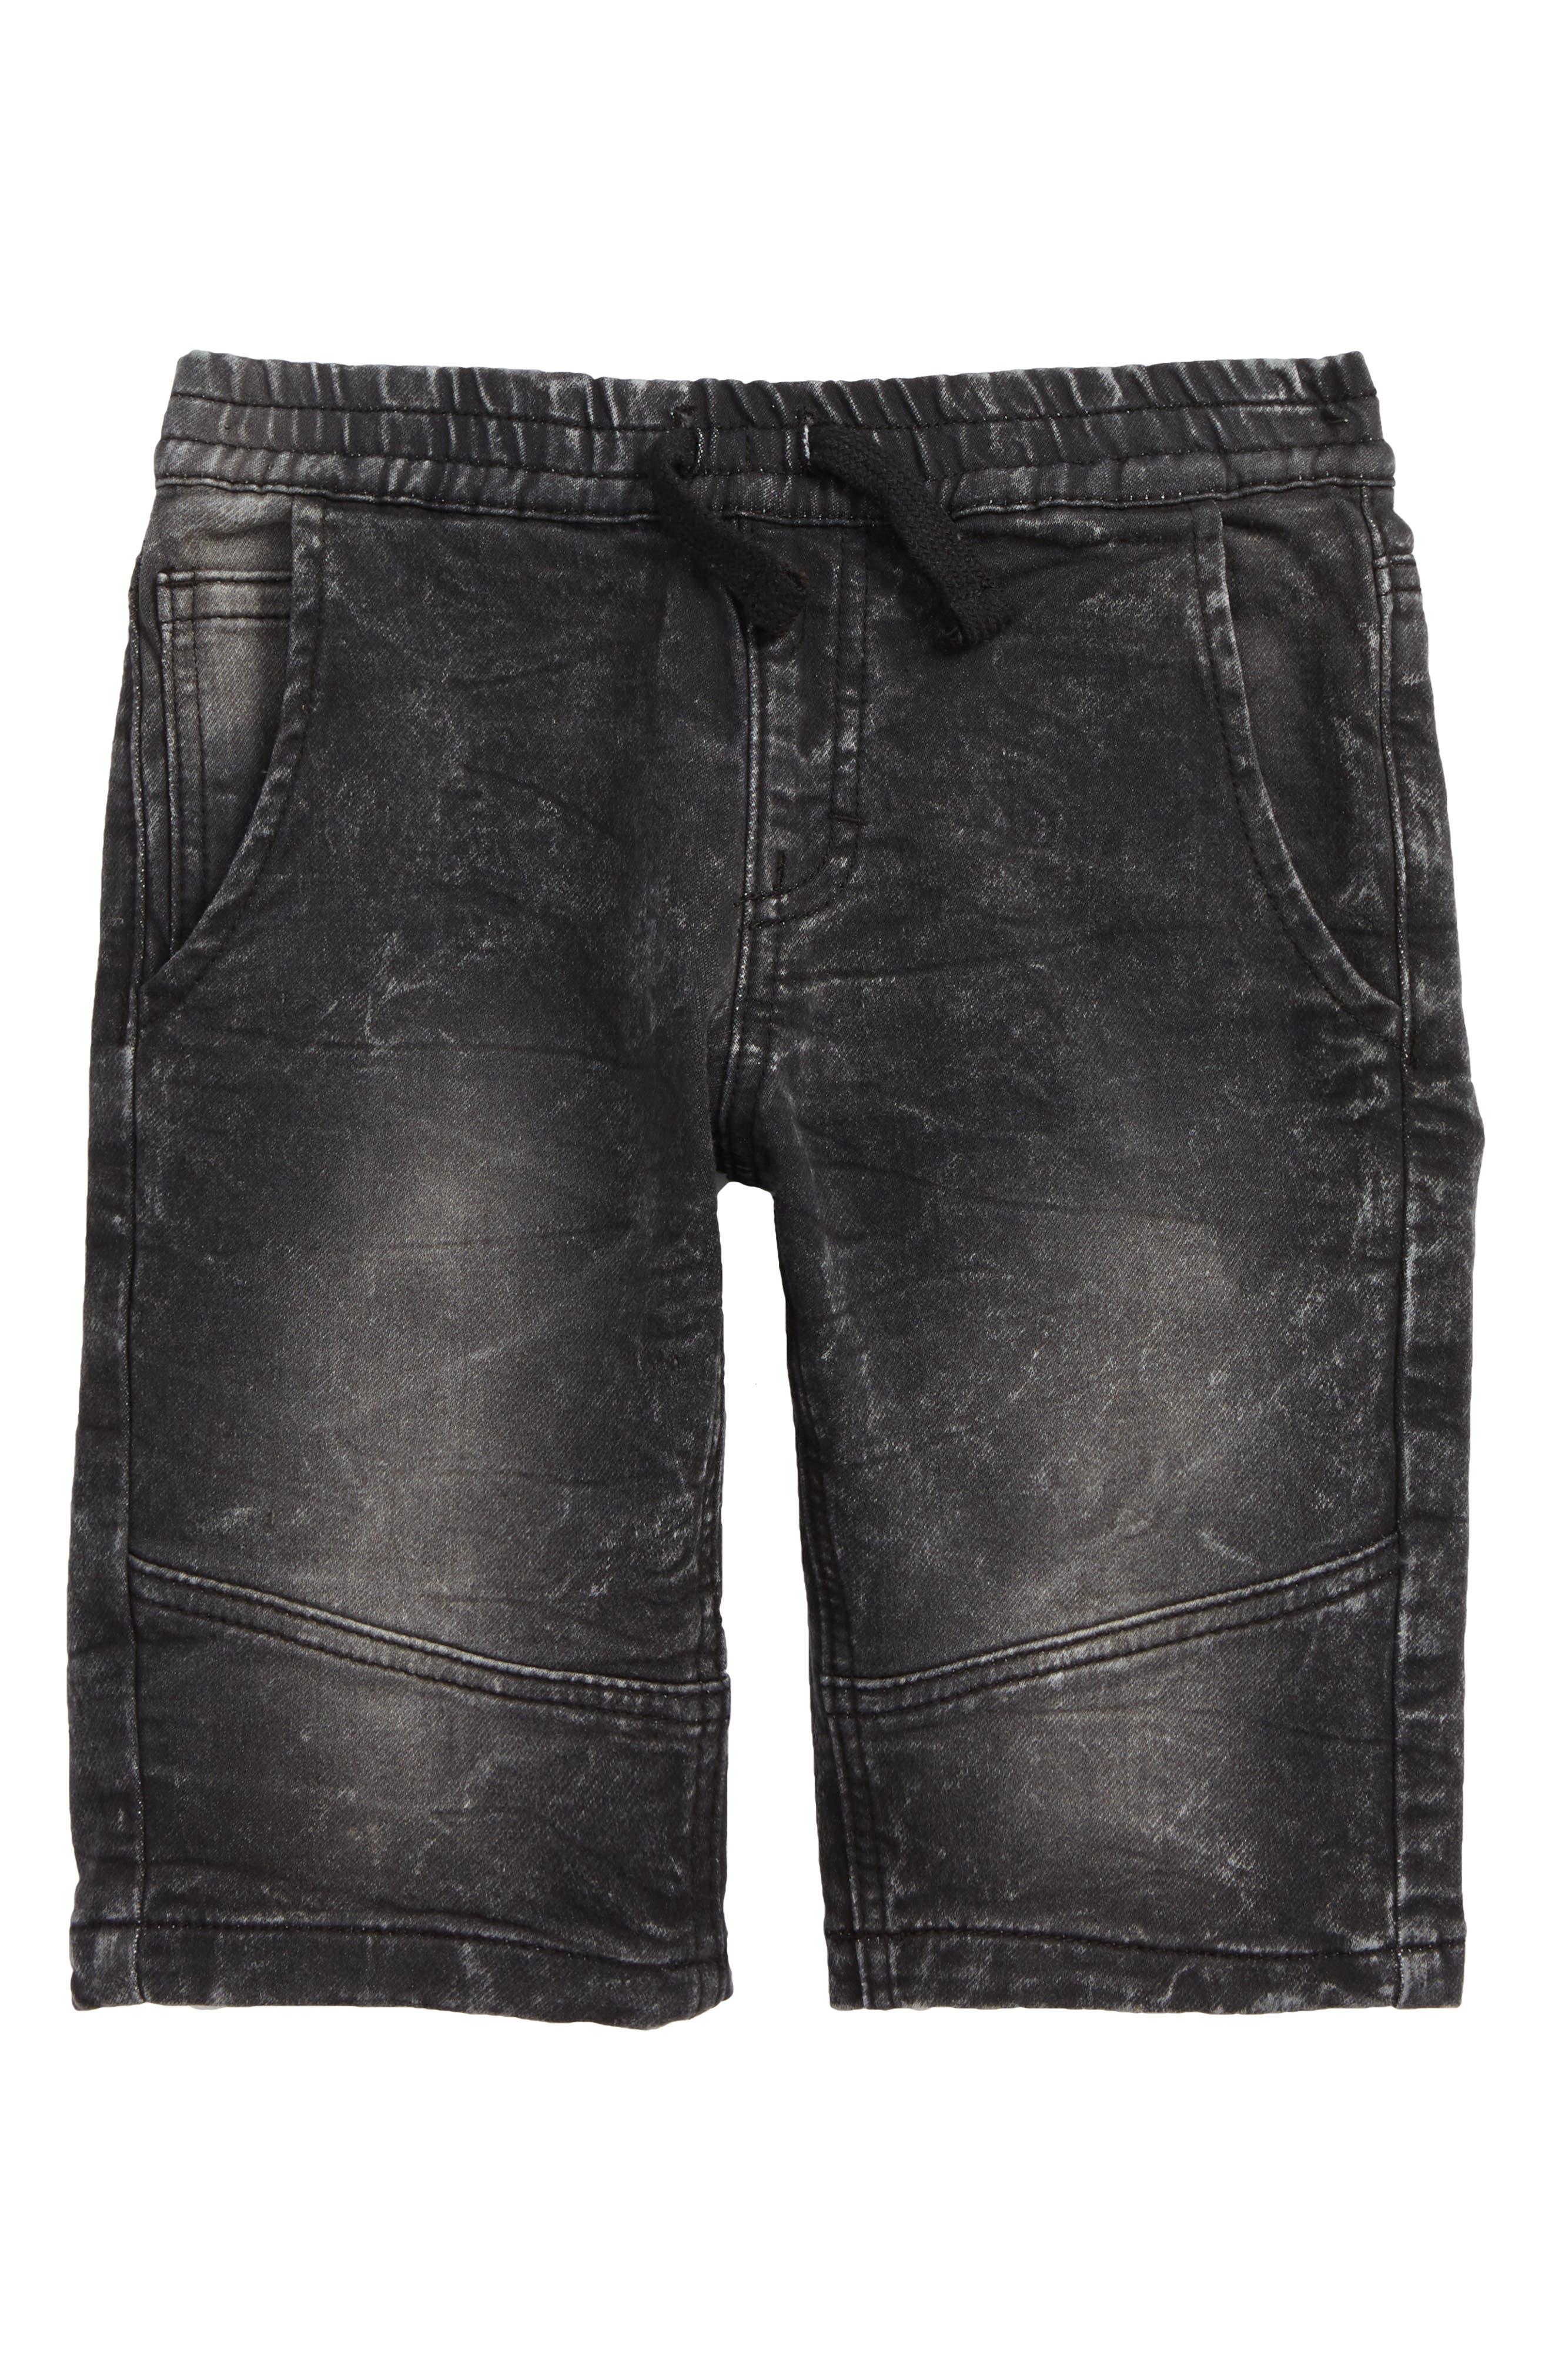 Stretch Denim Shorts,                             Main thumbnail 1, color,                             015